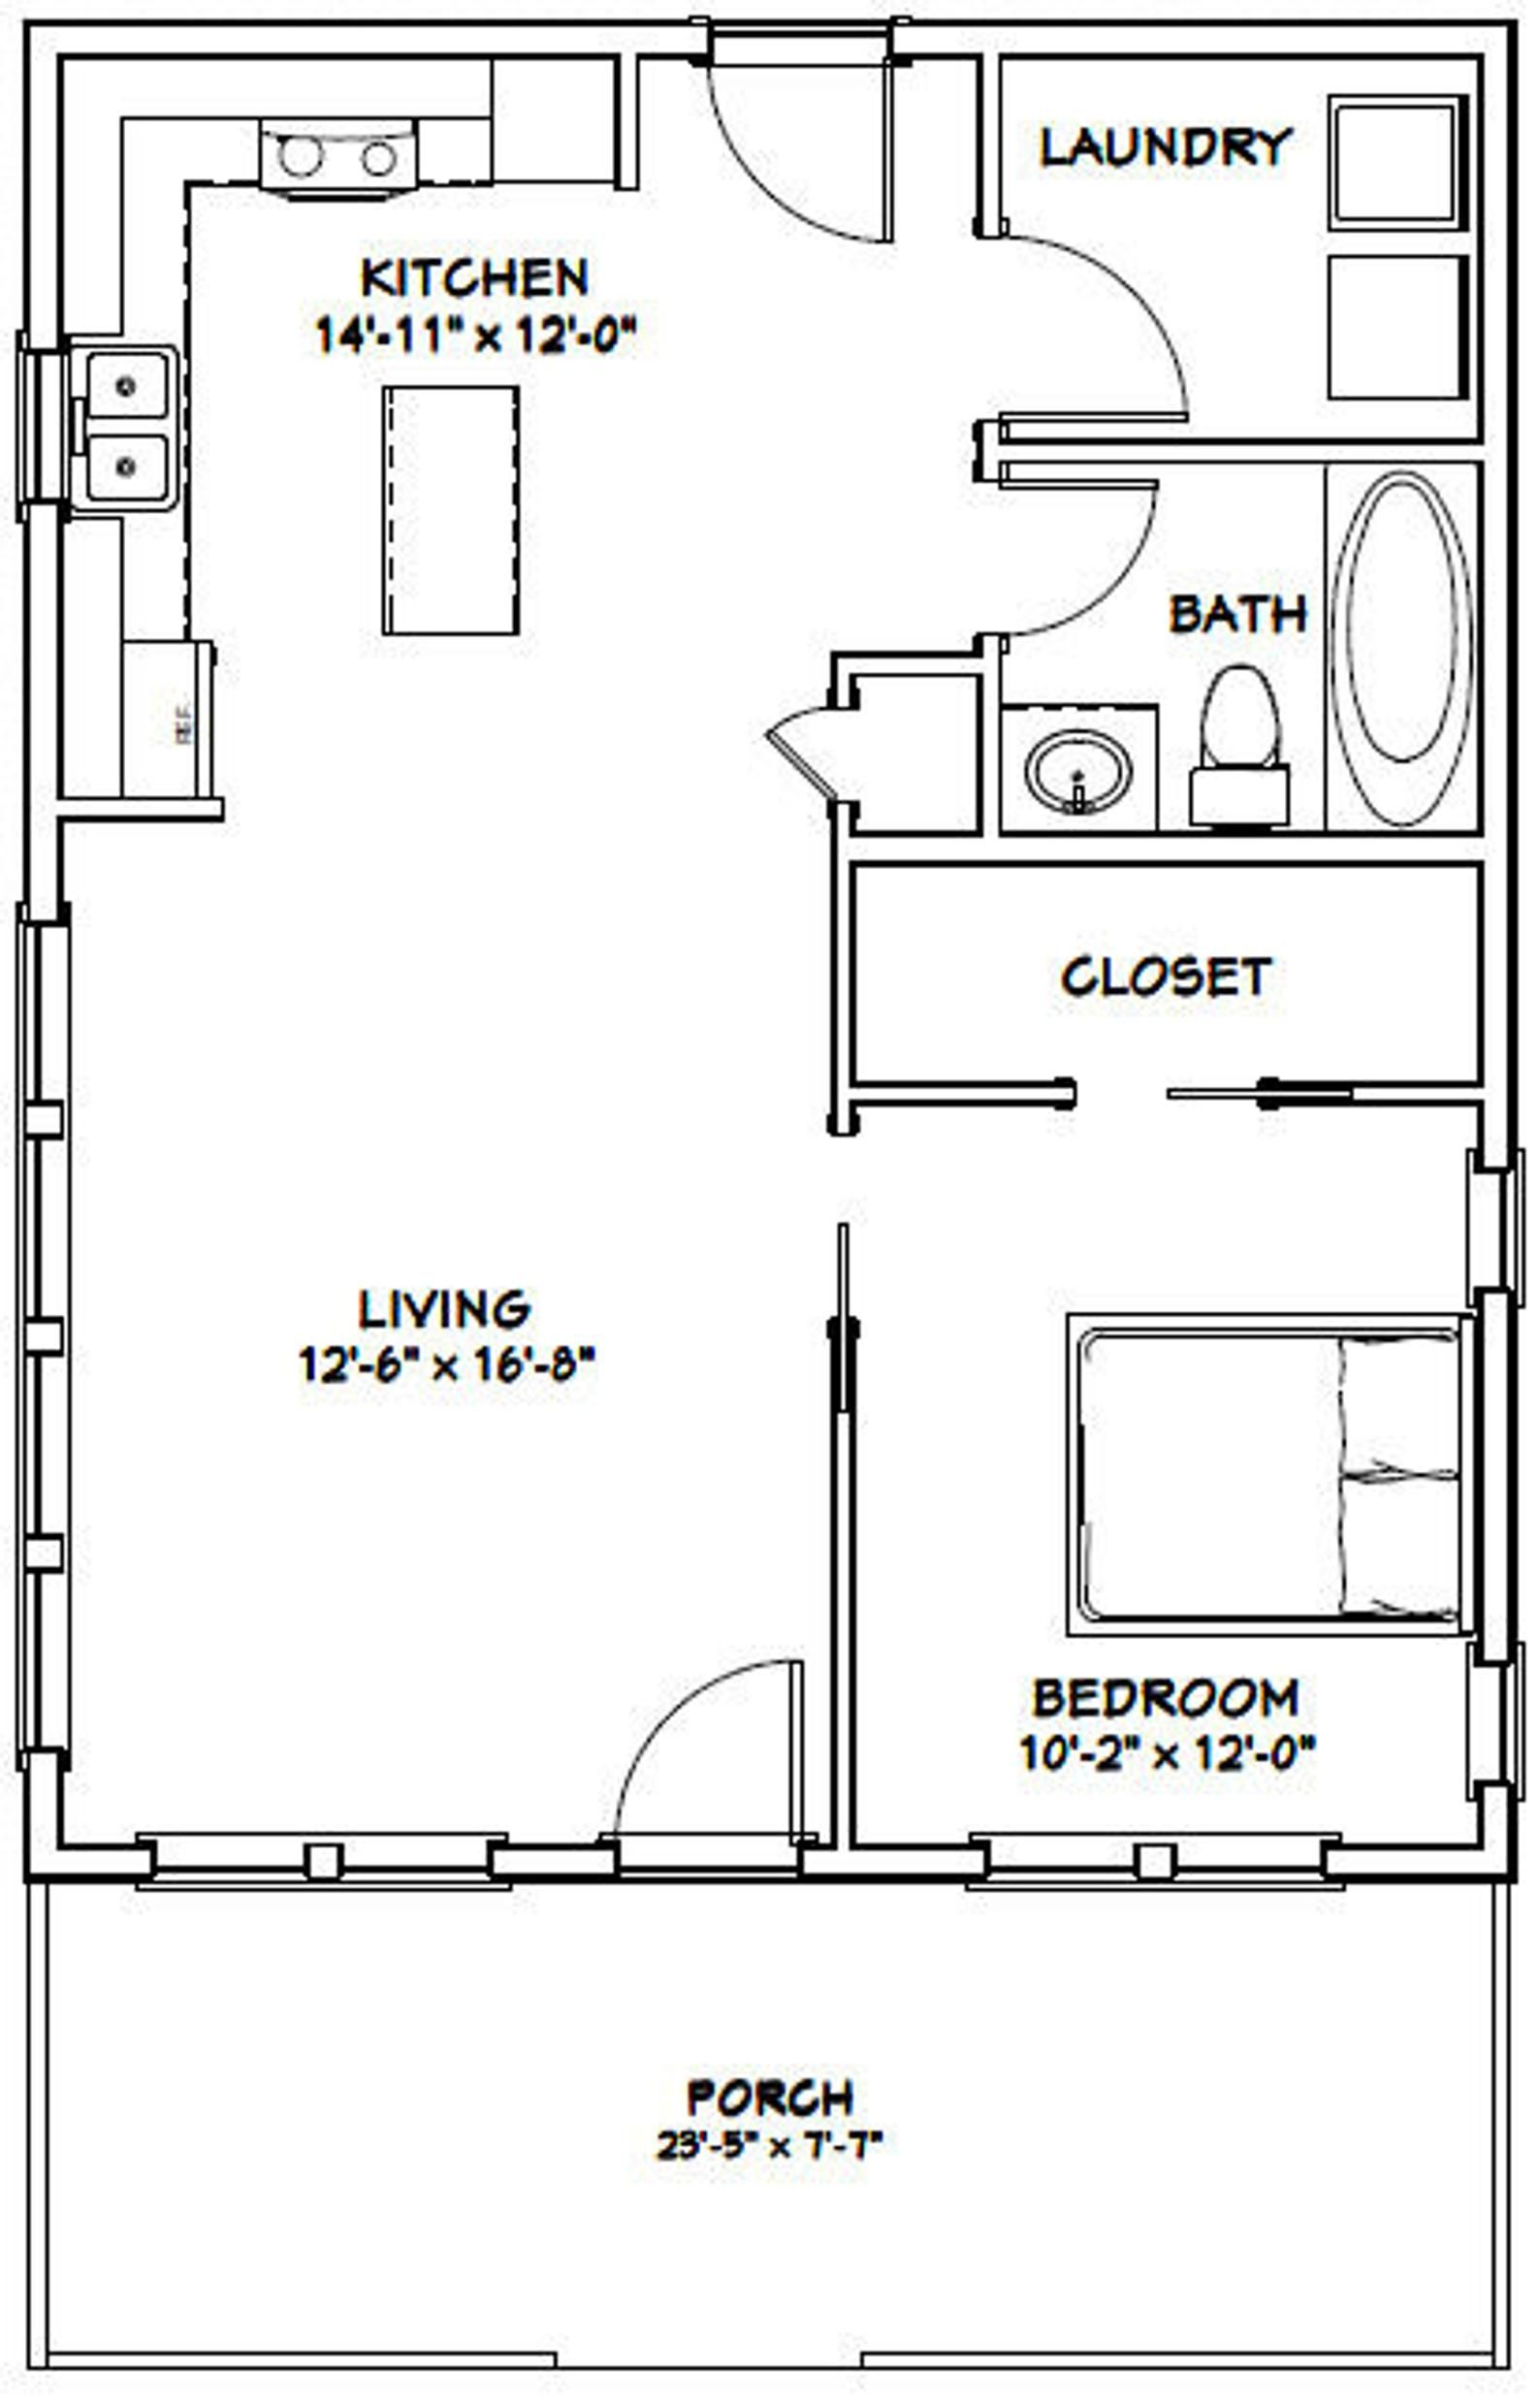 24x30 House 1 Bedroom 1 Bath 720 Sq Ft Pdf Floor Plan Etsy 1 Bedroom House Plans Tiny House Plans Tiny House Floor Plans